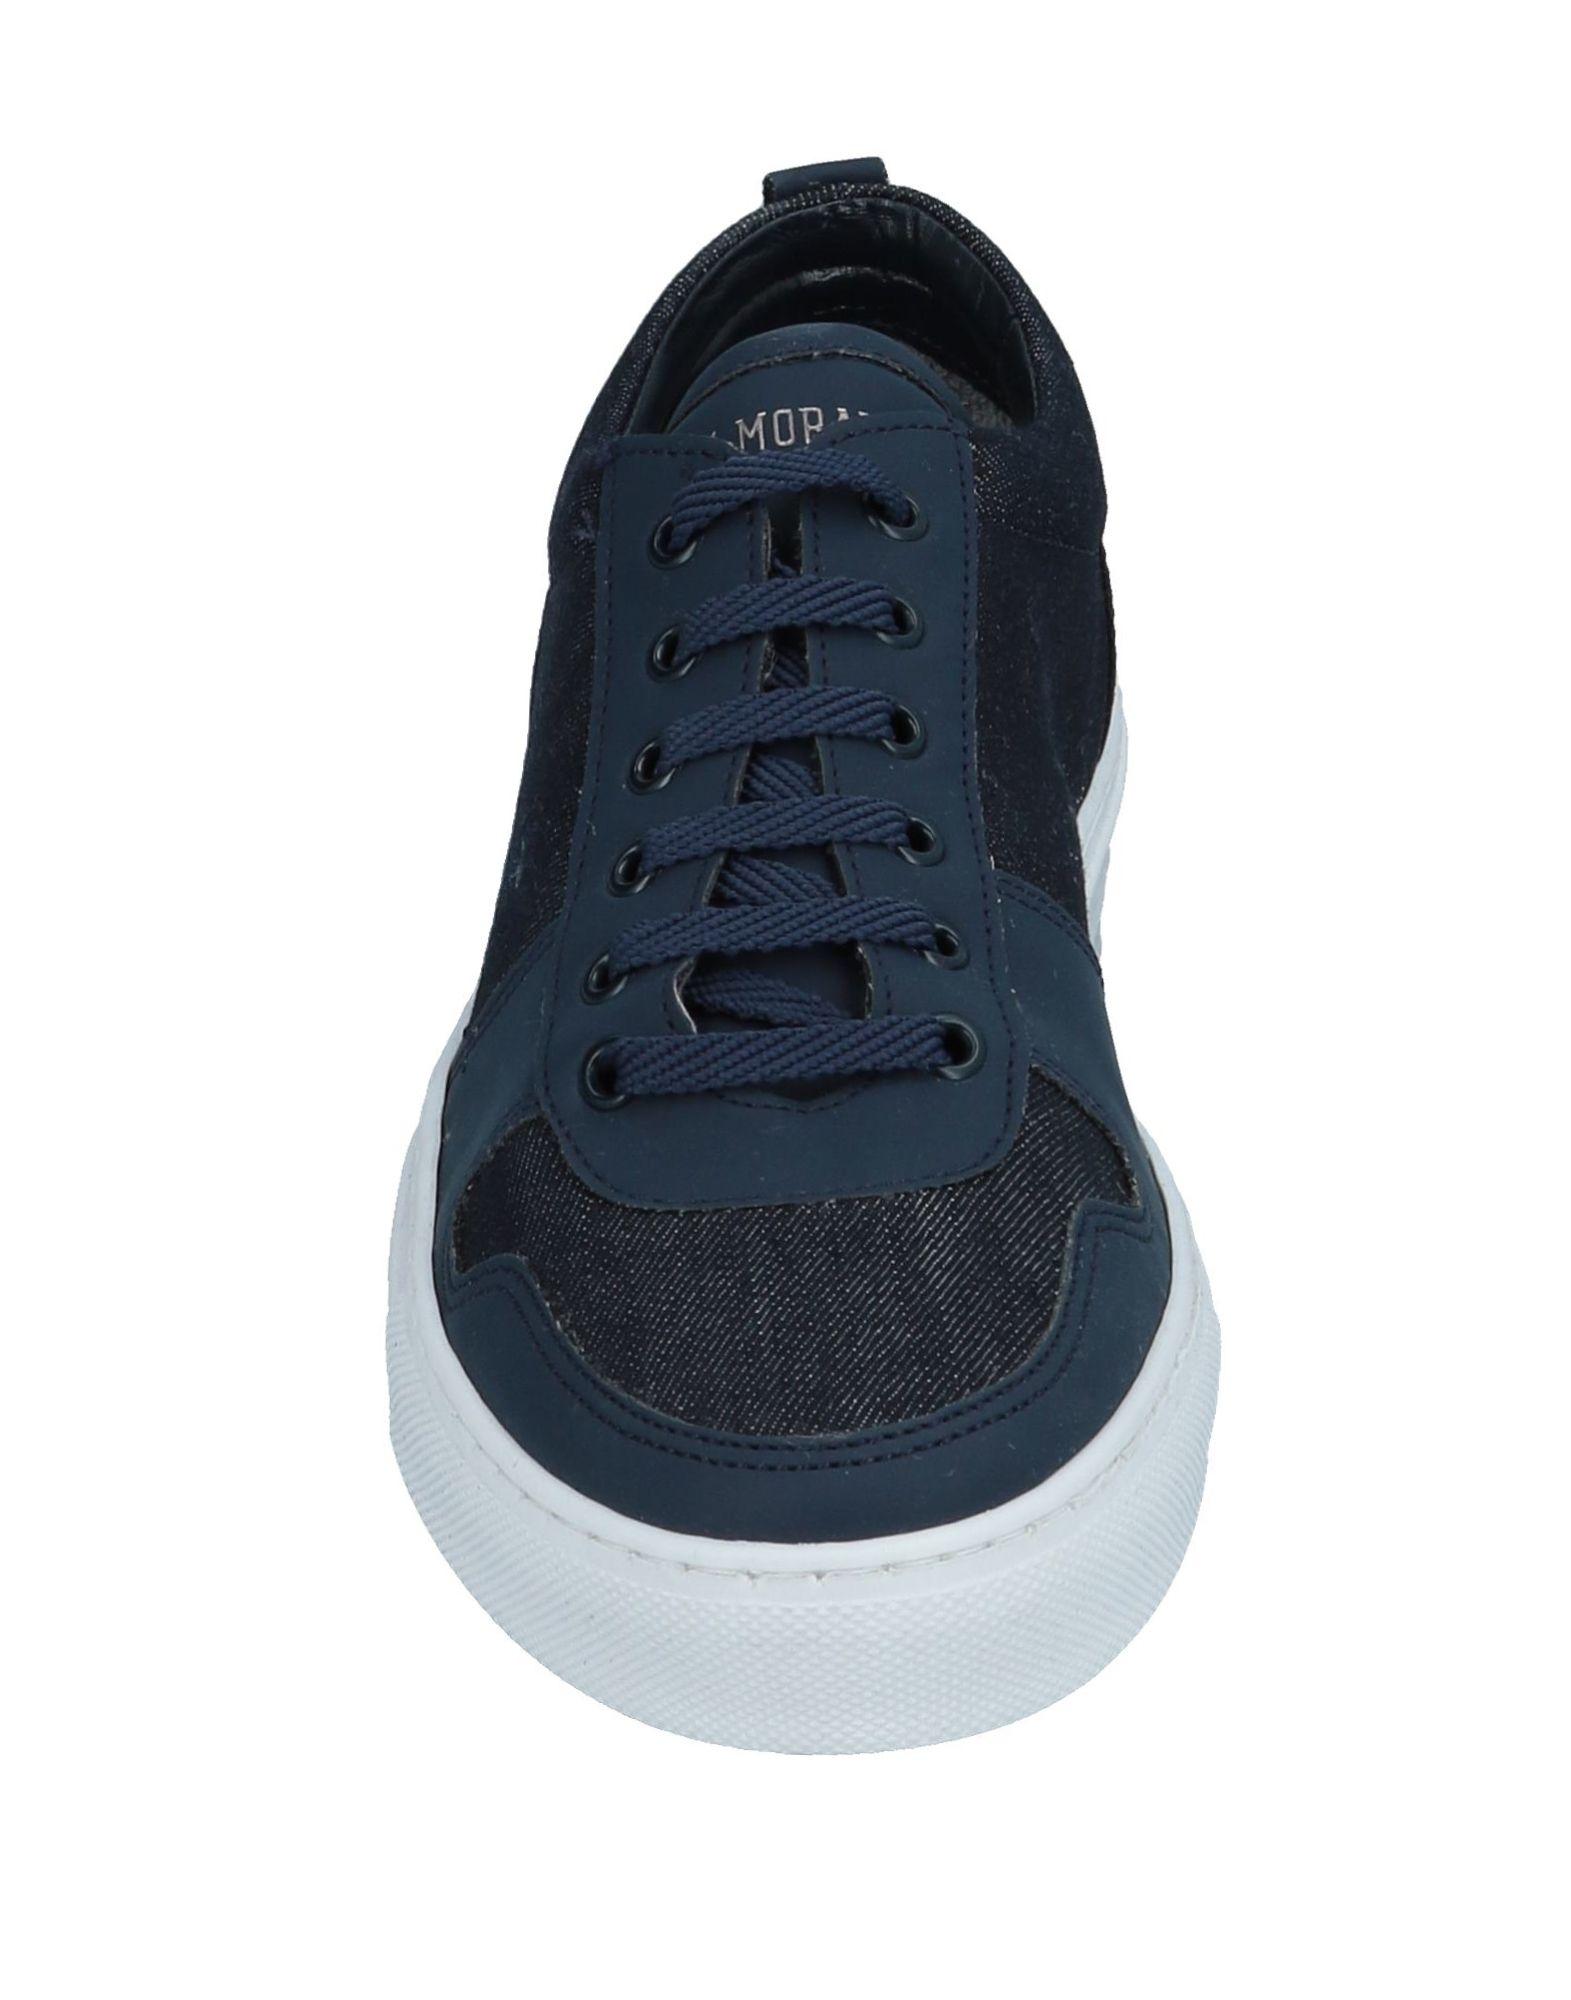 Rabatt echte Schuhe Herren Antony Morato Sneakers Herren Schuhe  11548736EK 5e9bf2